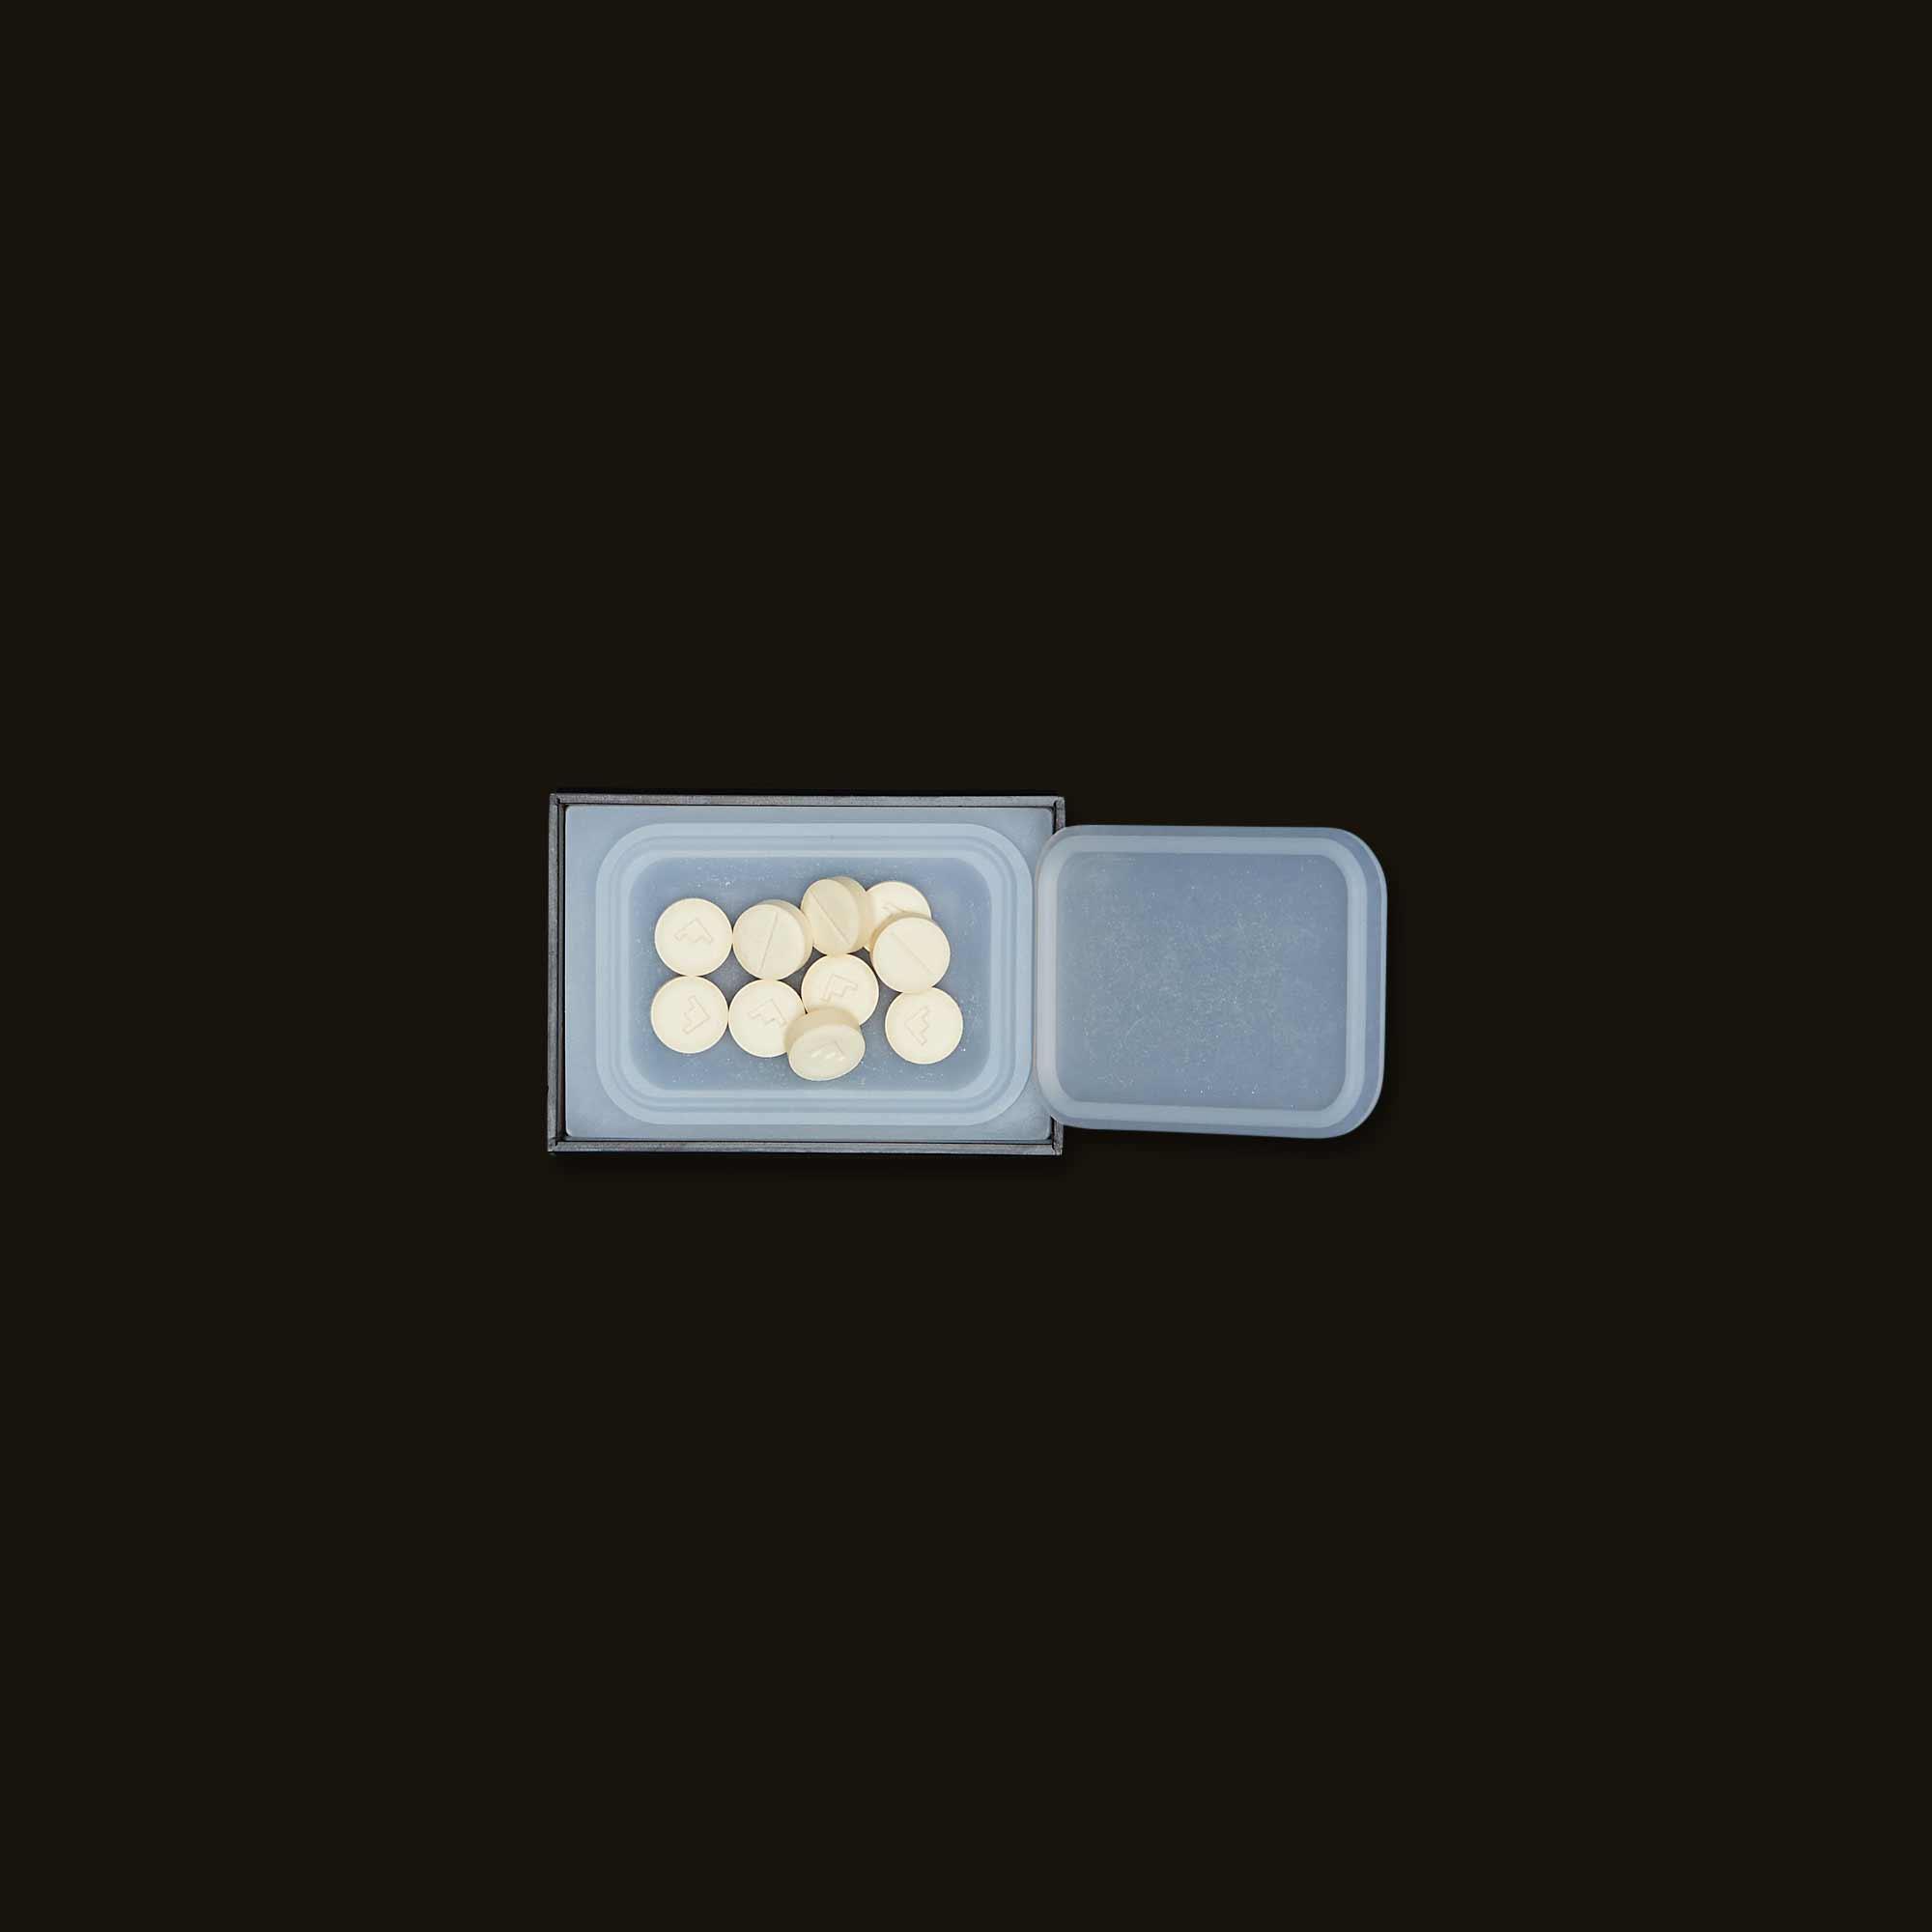 box of Protab Indica pills